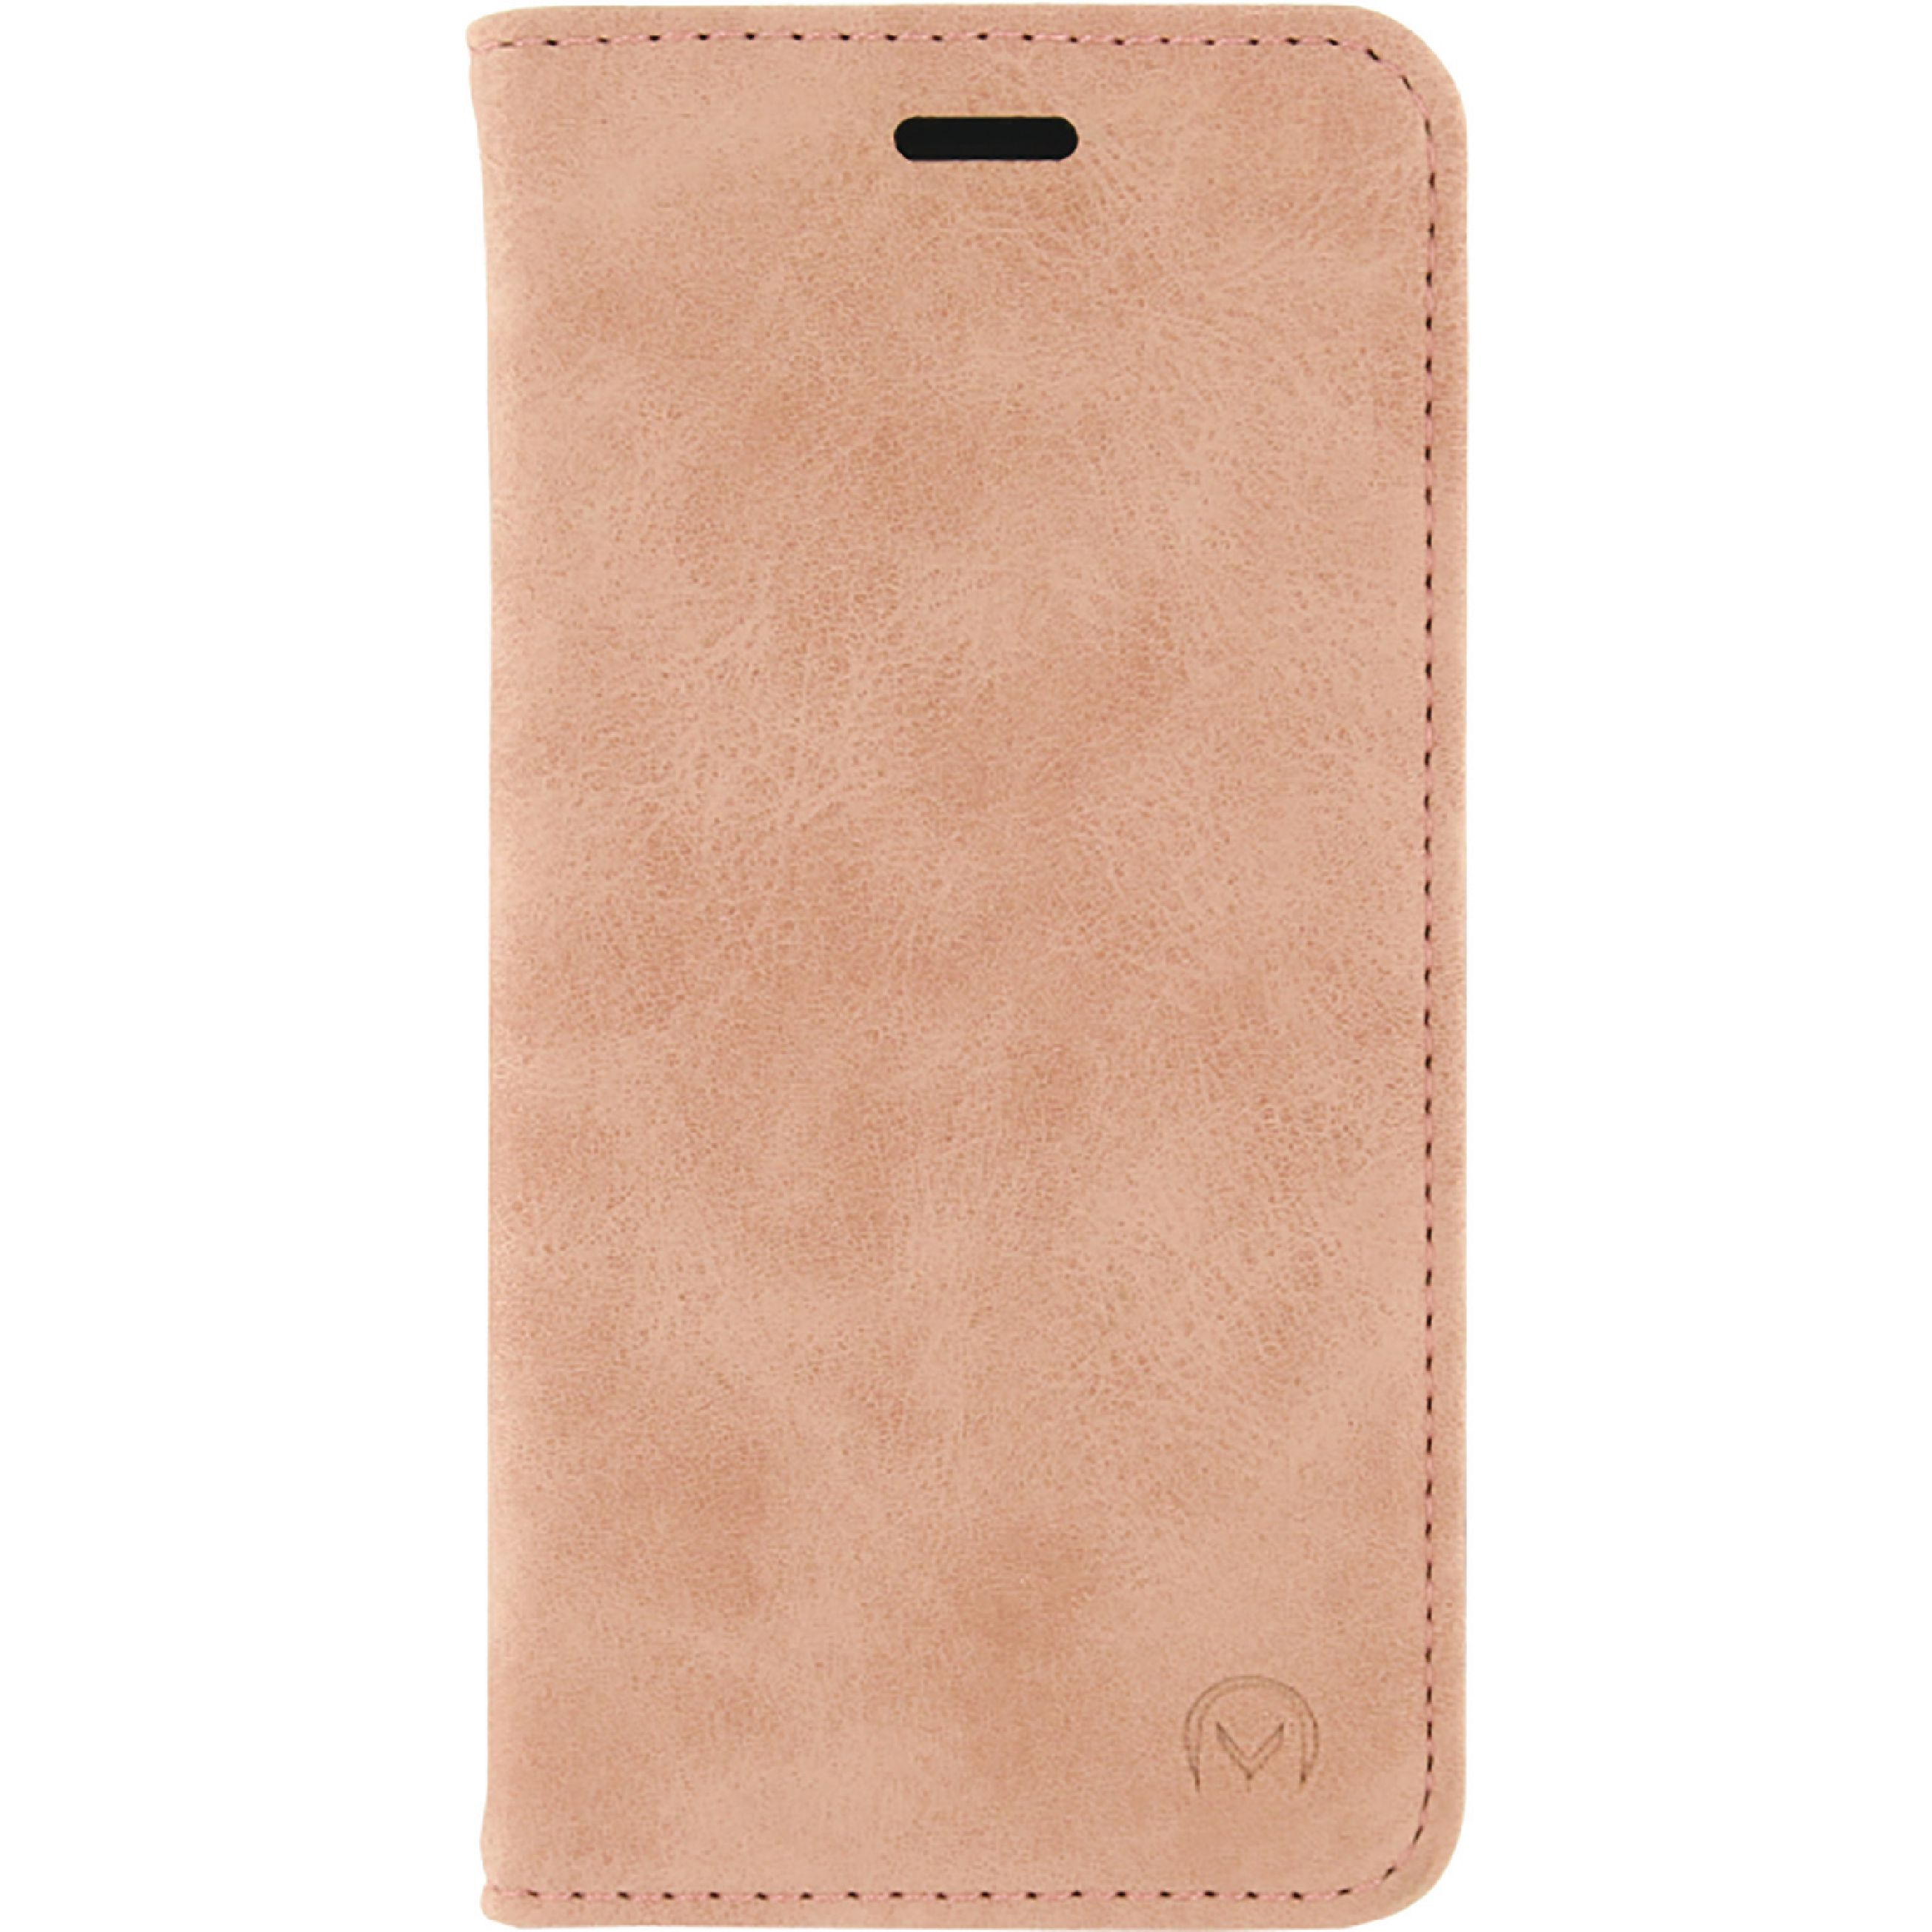 Image of   Telefon Premium Blødt Bogetui Samsung Galaxy J3 2016 Pink